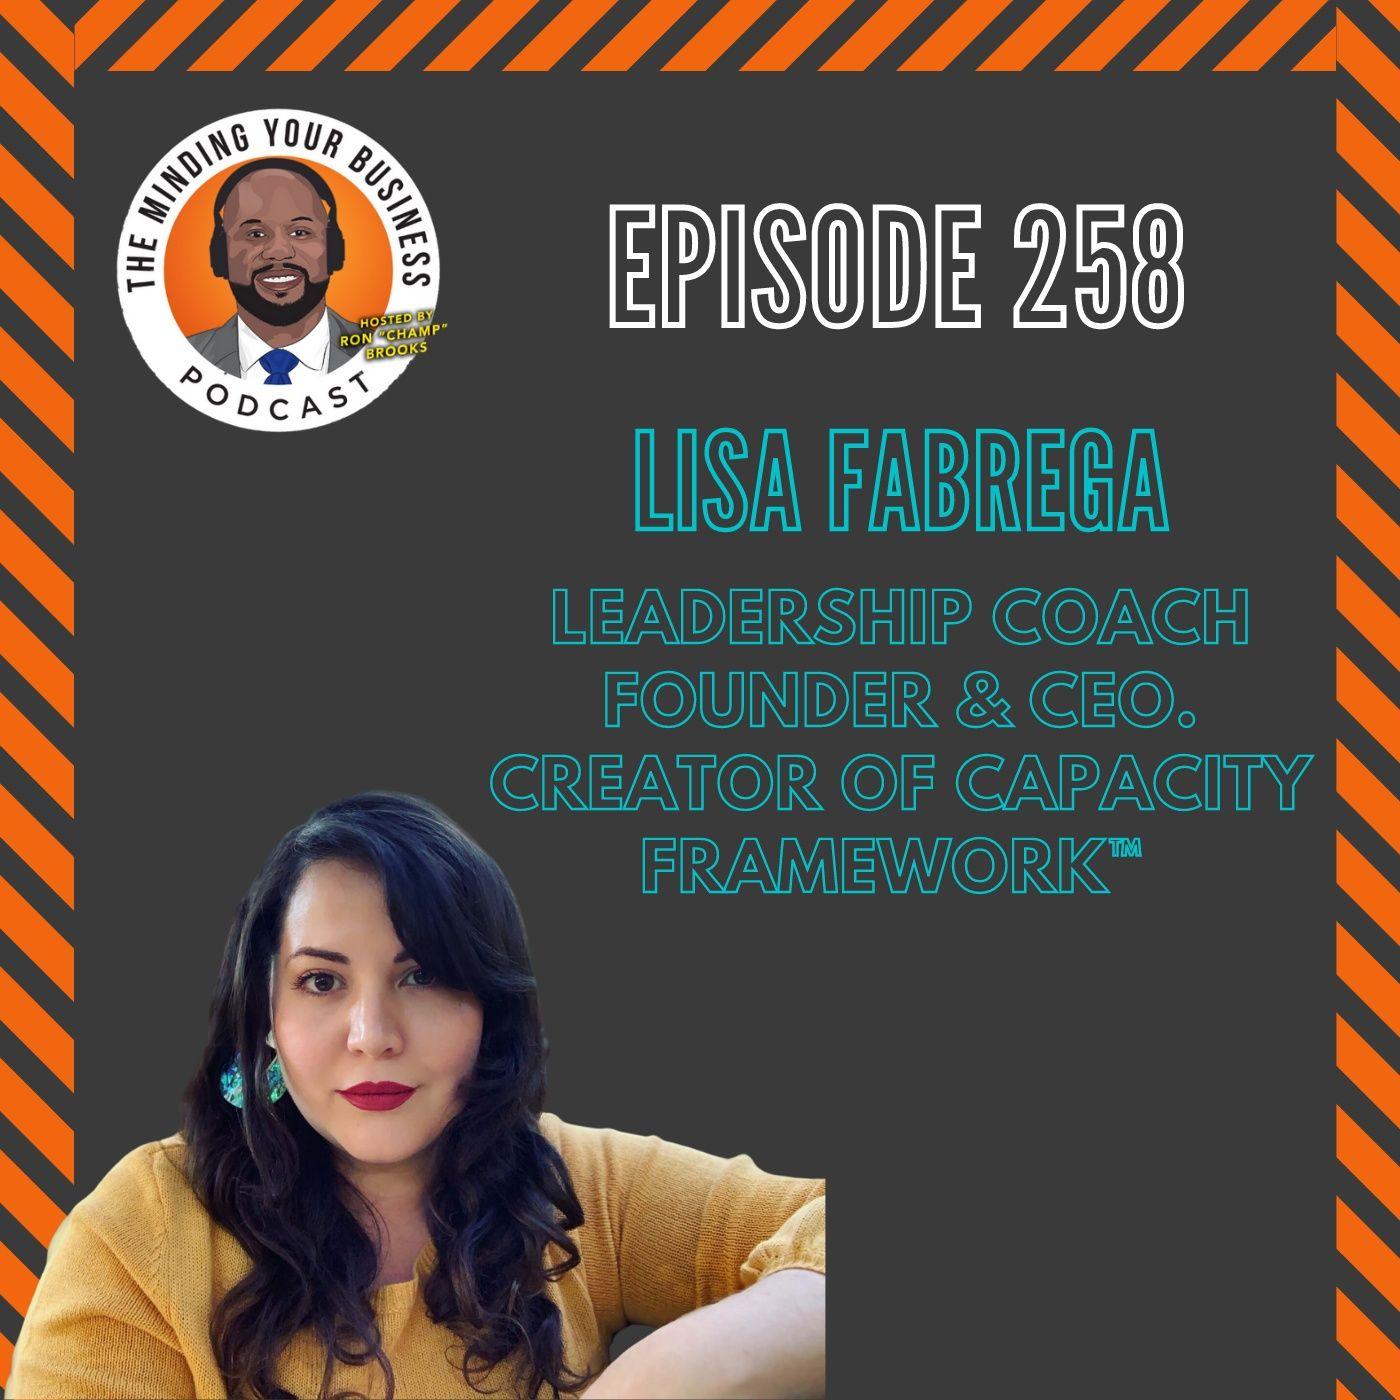 #258 - Lisa Fabrega, Founder & CEO. Creator of Capacity Framework™️ & Leadership Coach